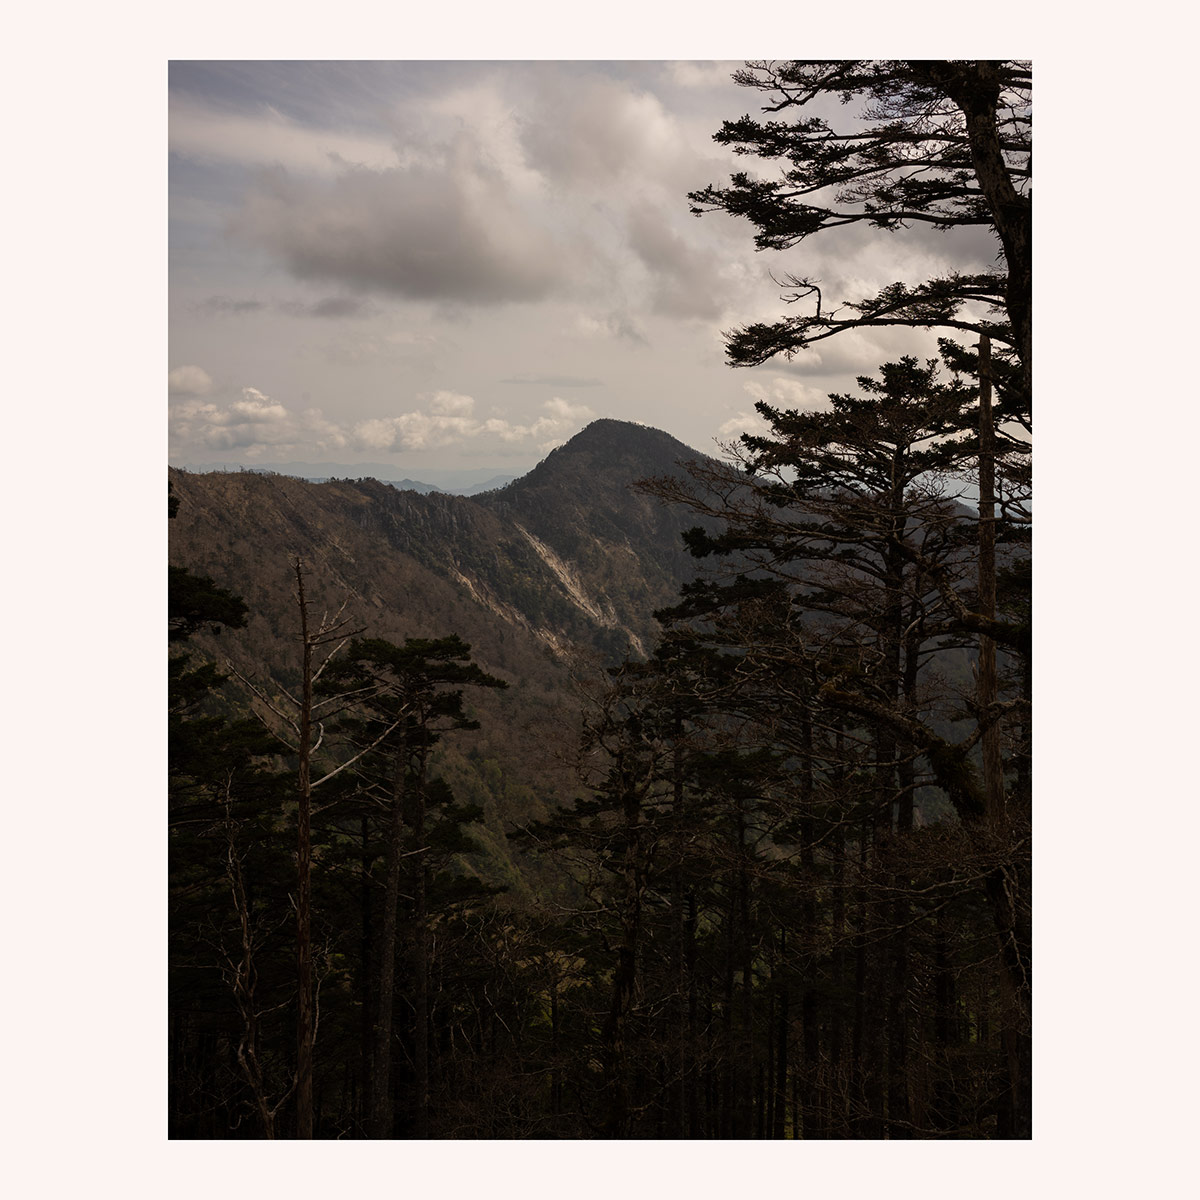 Ridgeline distance